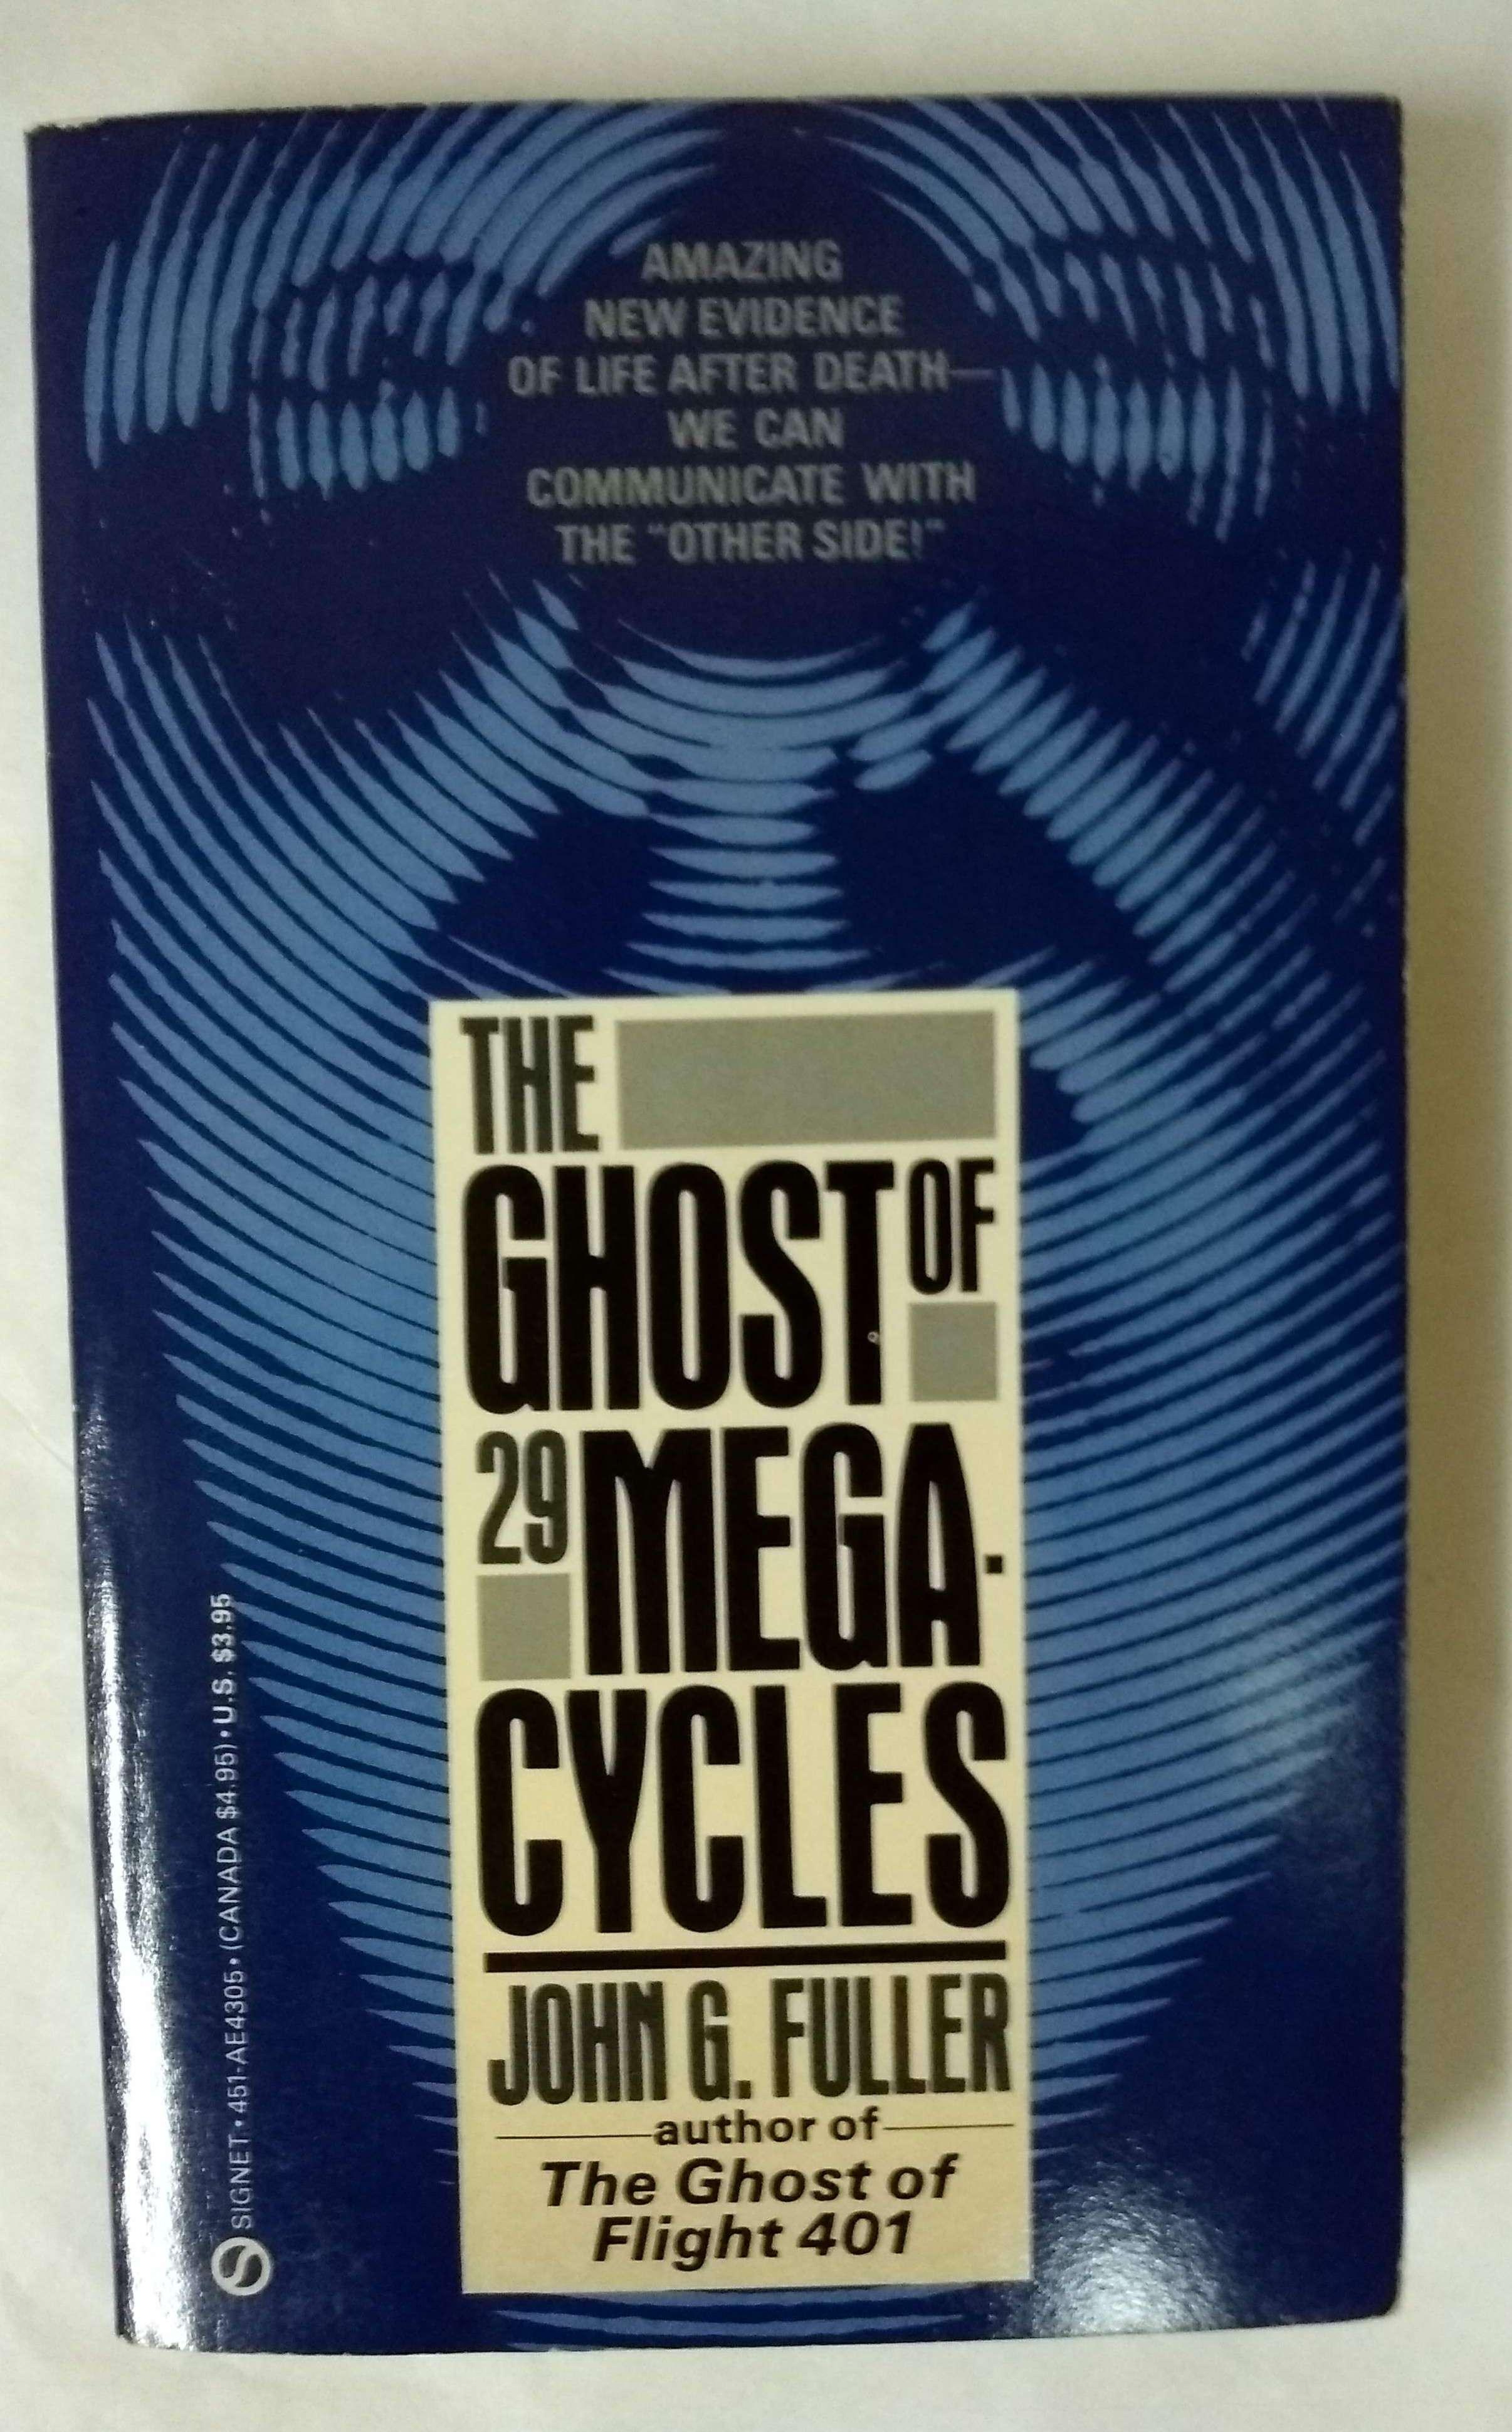 The Ghost of 29 Megacycles, Fuller, John G.